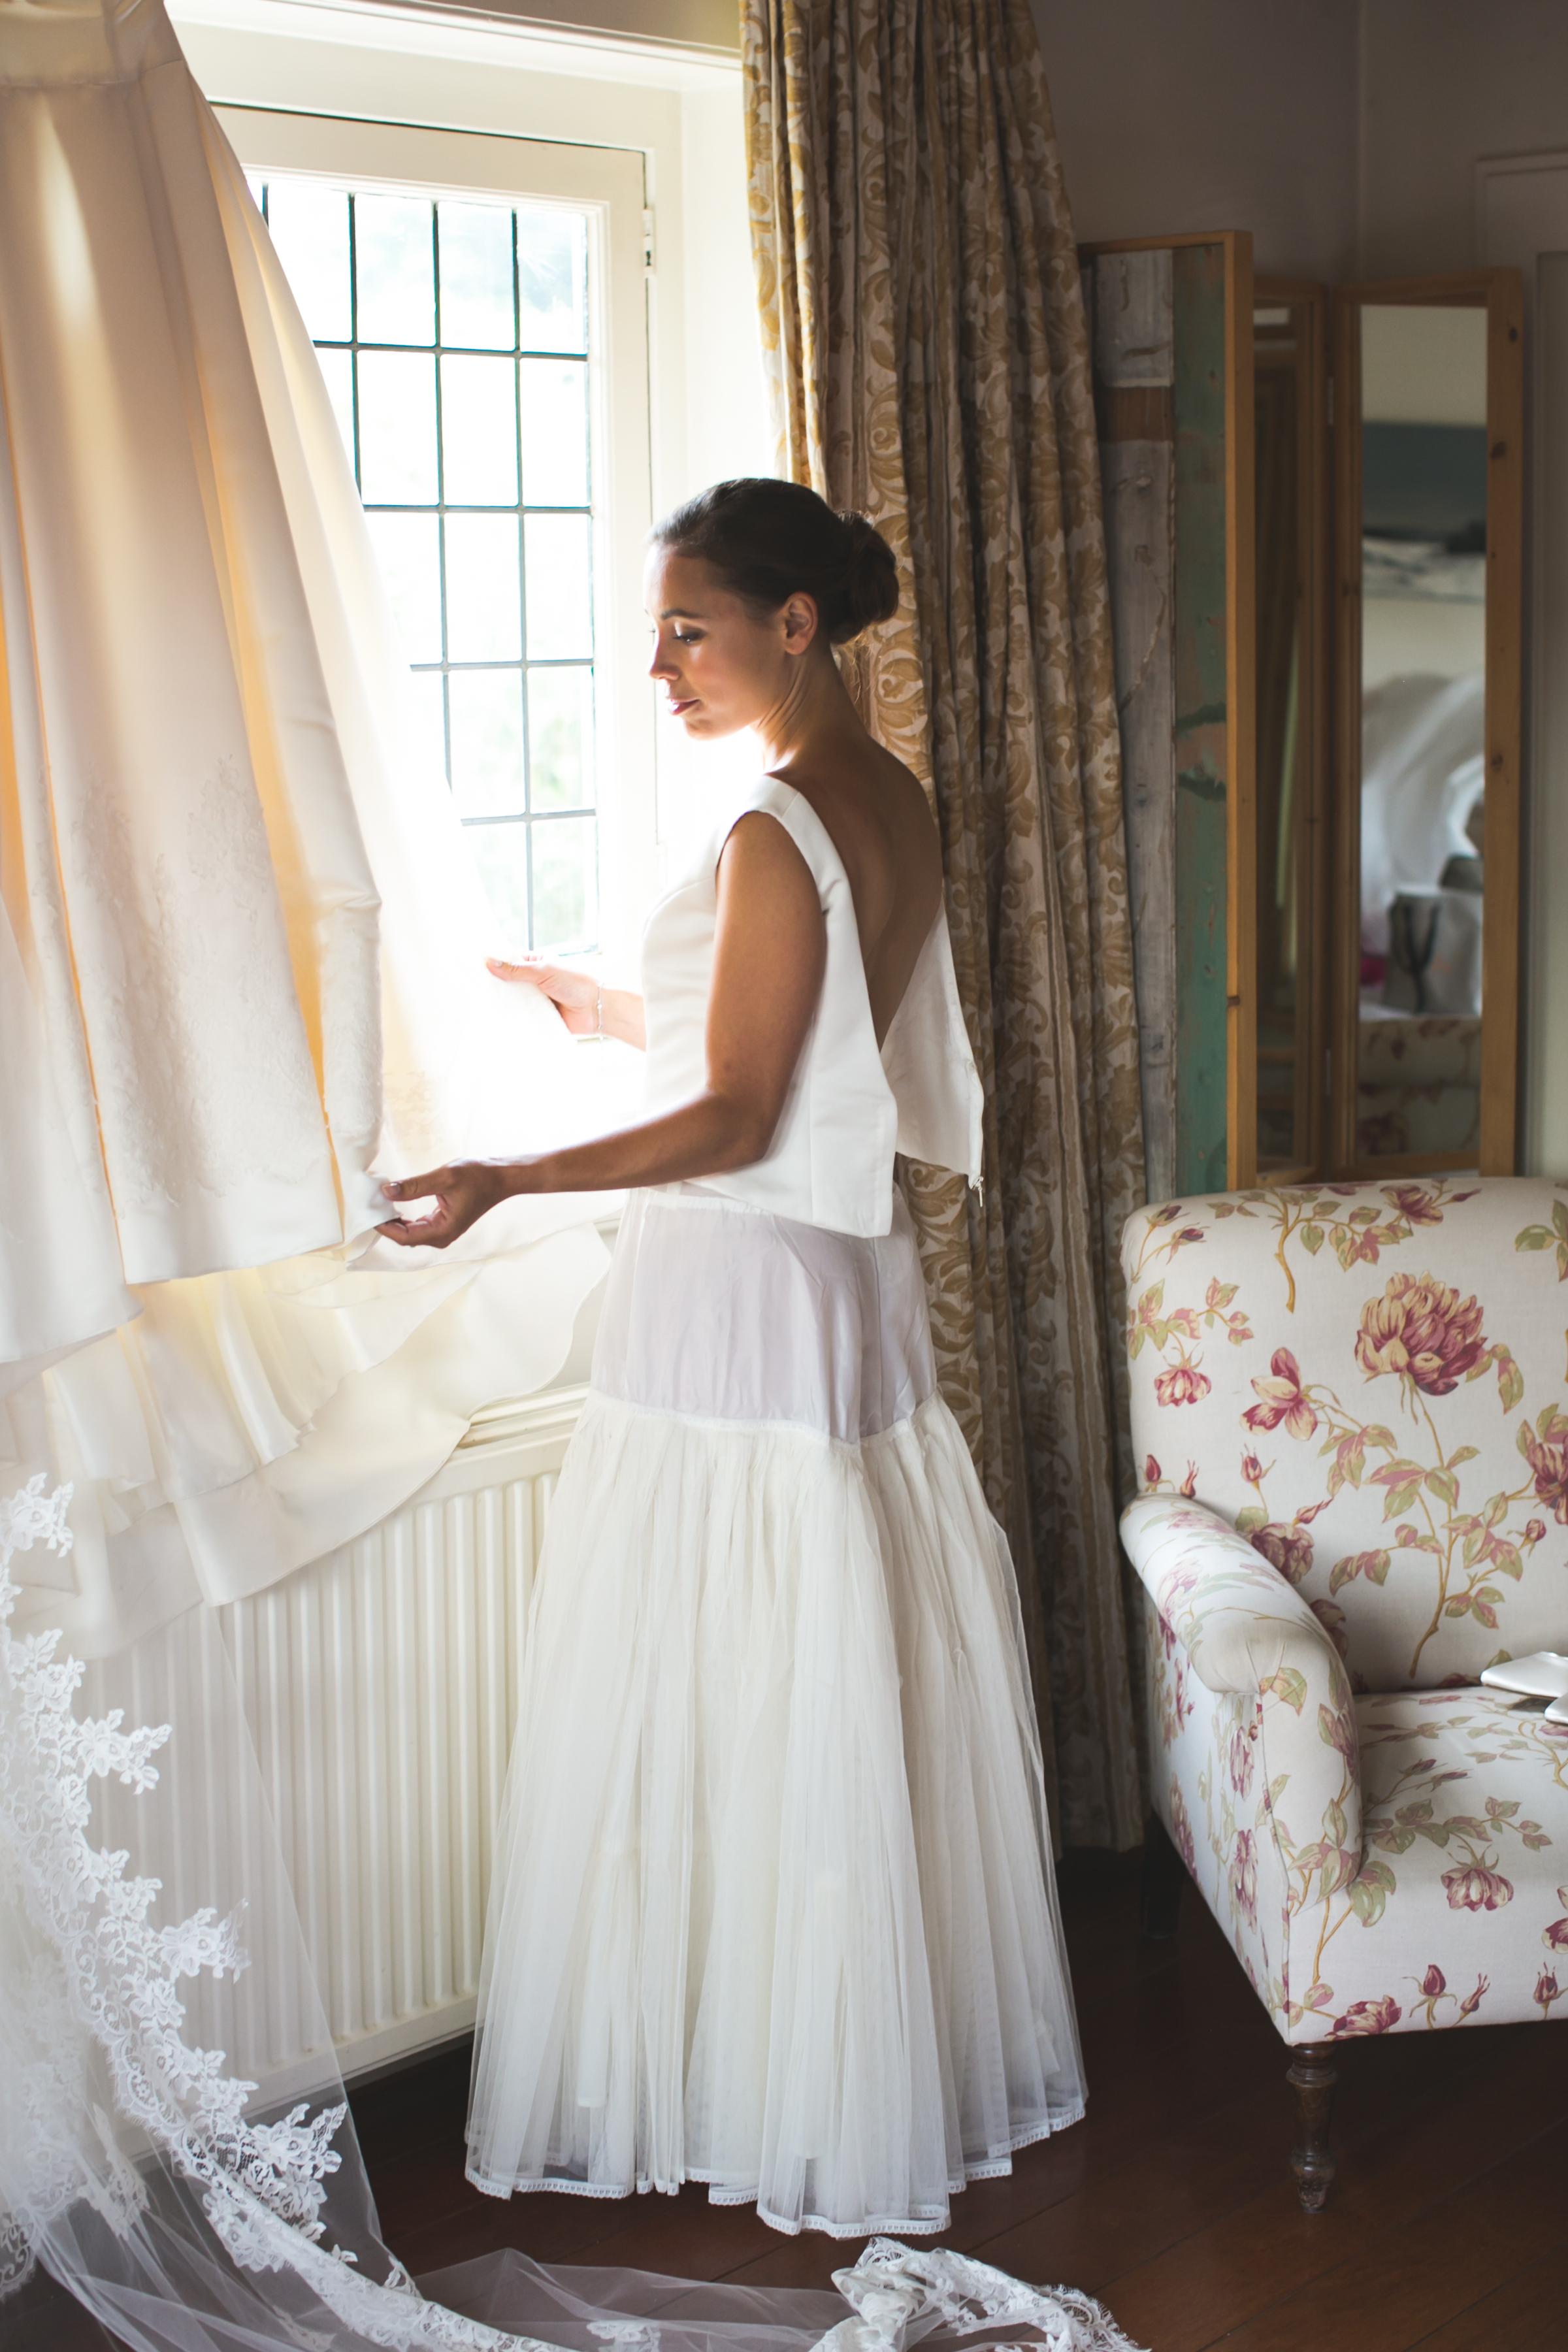 bruidvoorbereiding.jpg